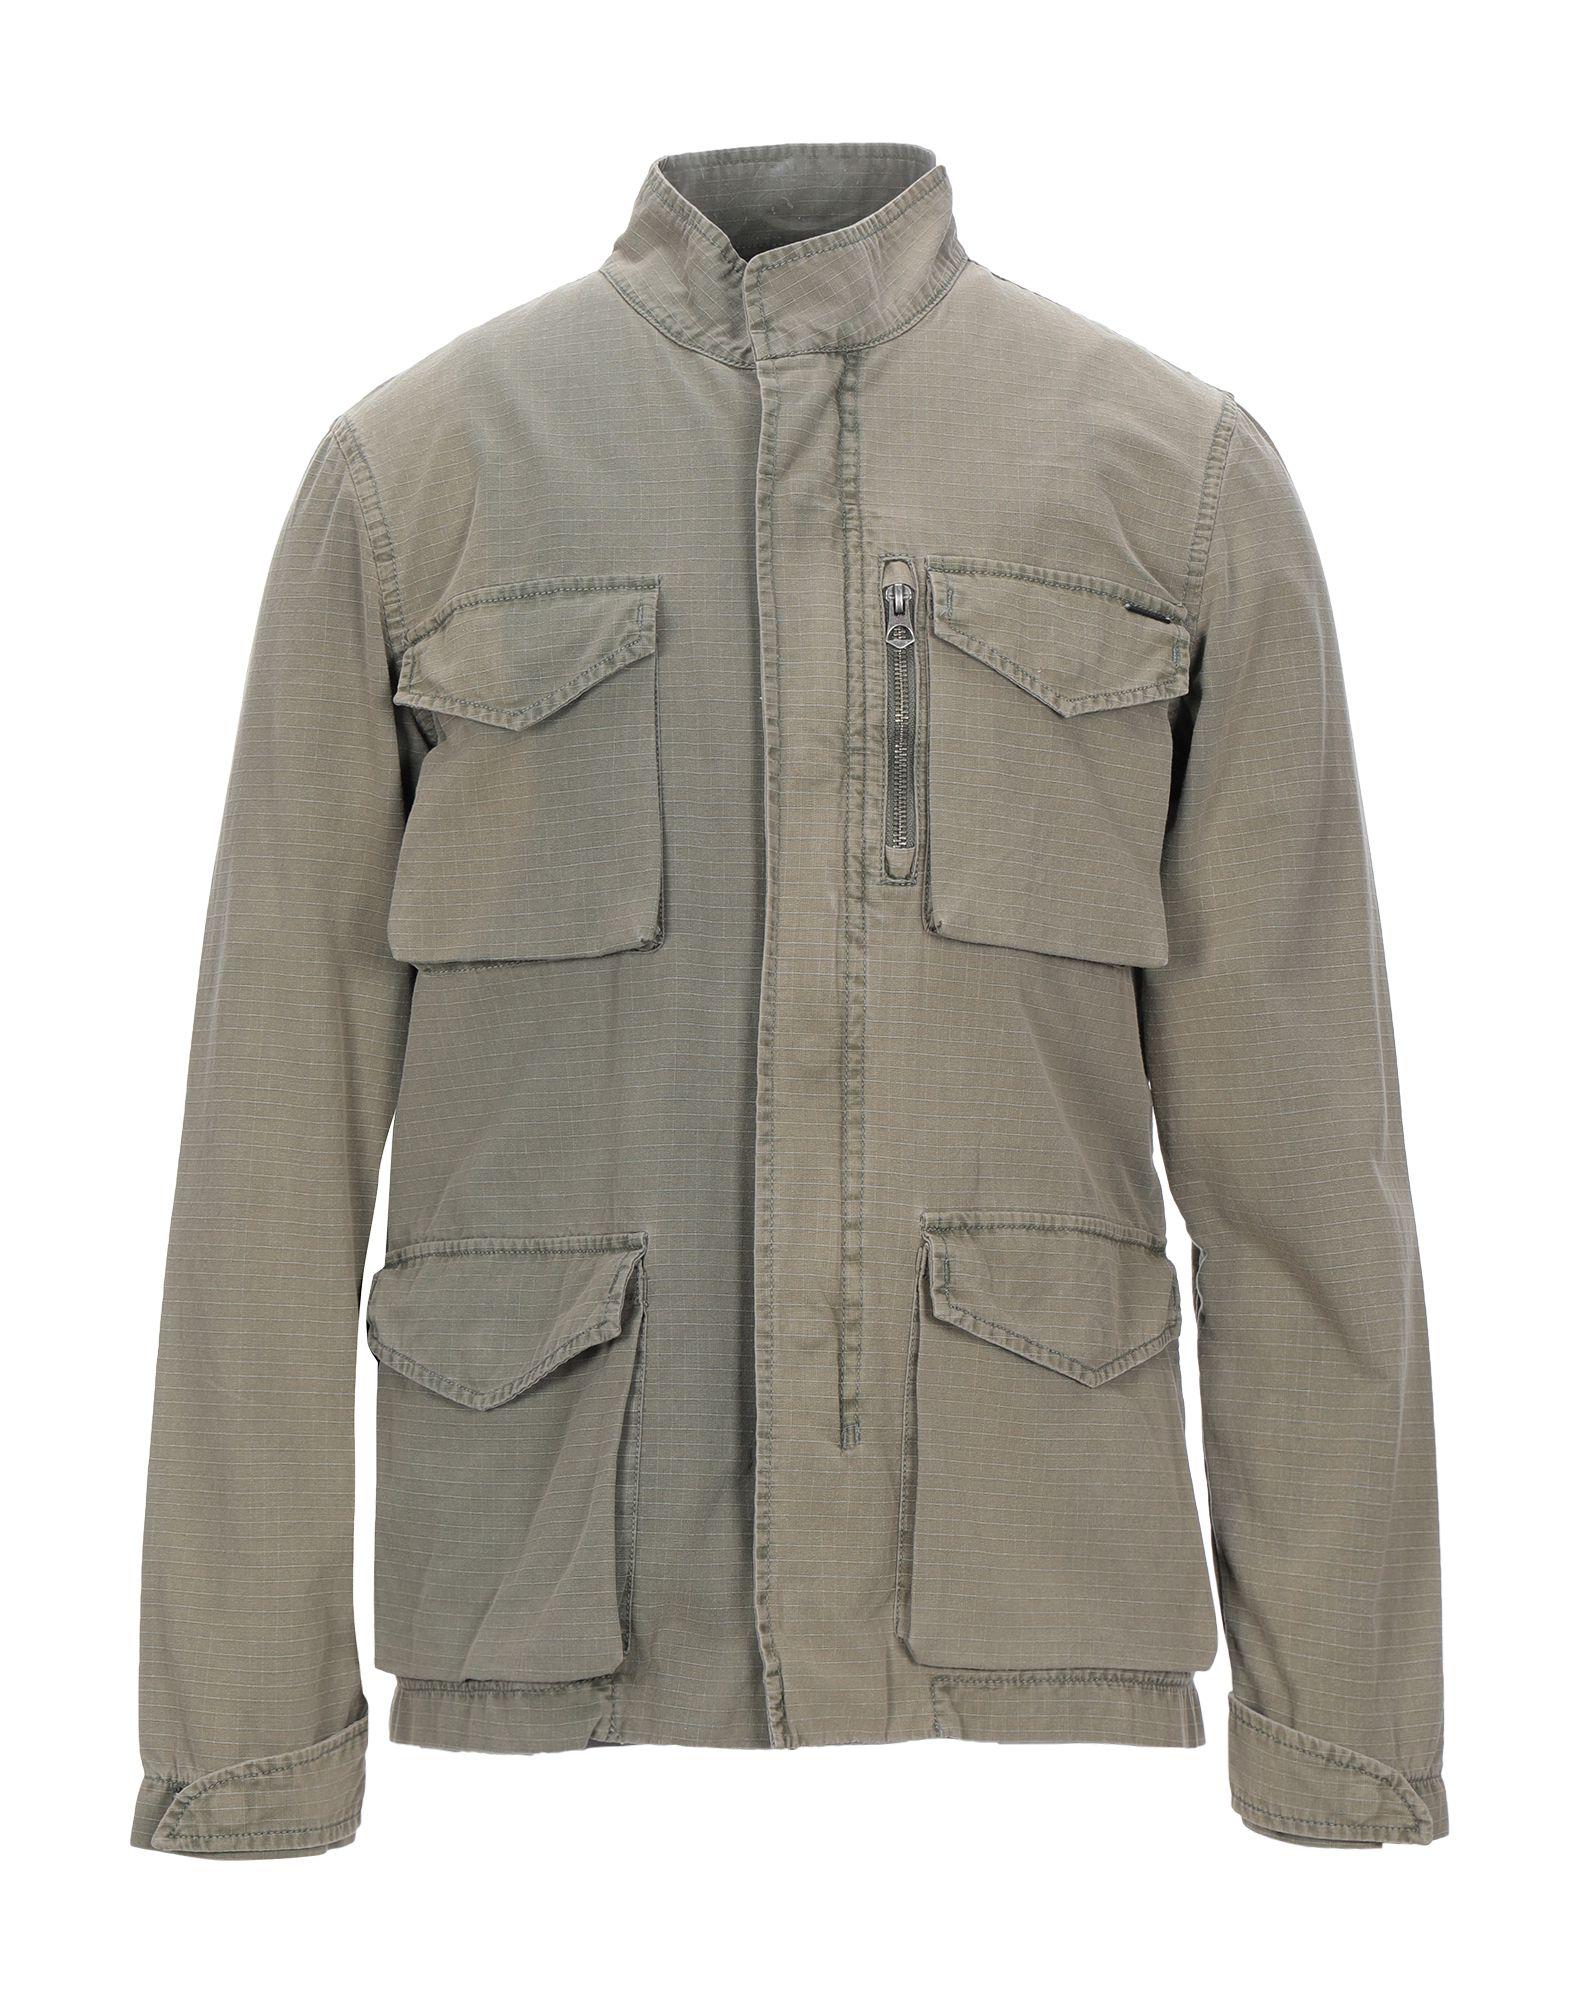 Фото - HOMEWARD CLOTHES Куртка homeward clothes бермуды